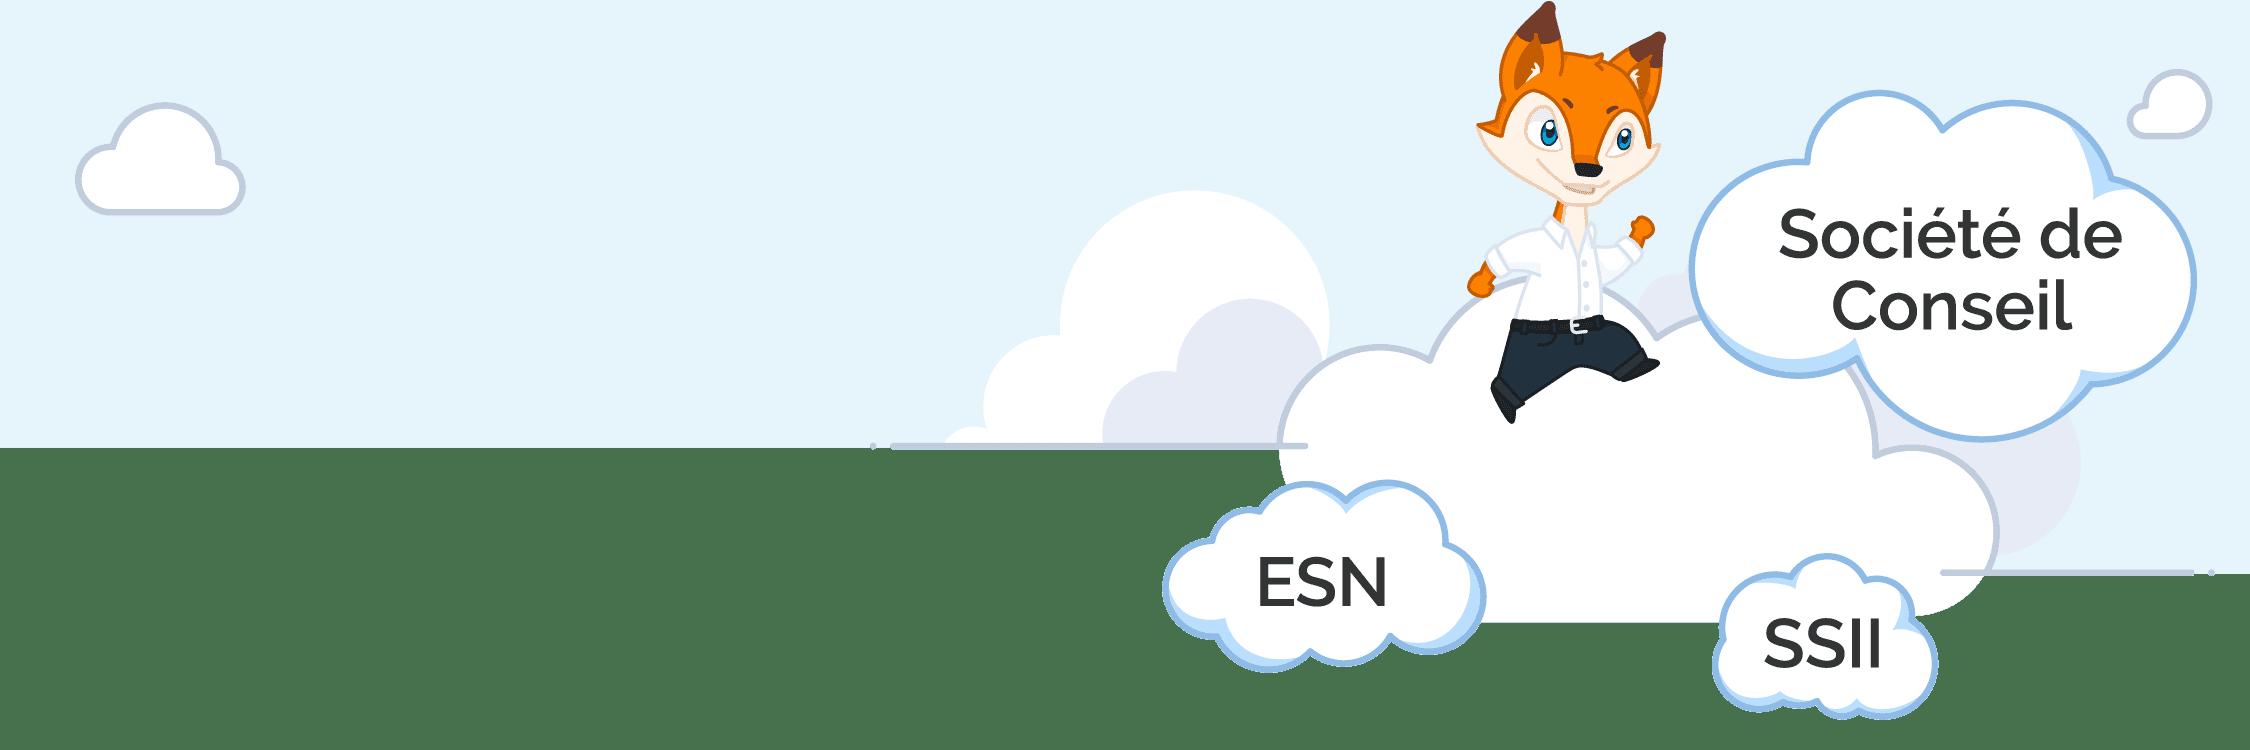 boondmanager-headers-cloud-jump-new